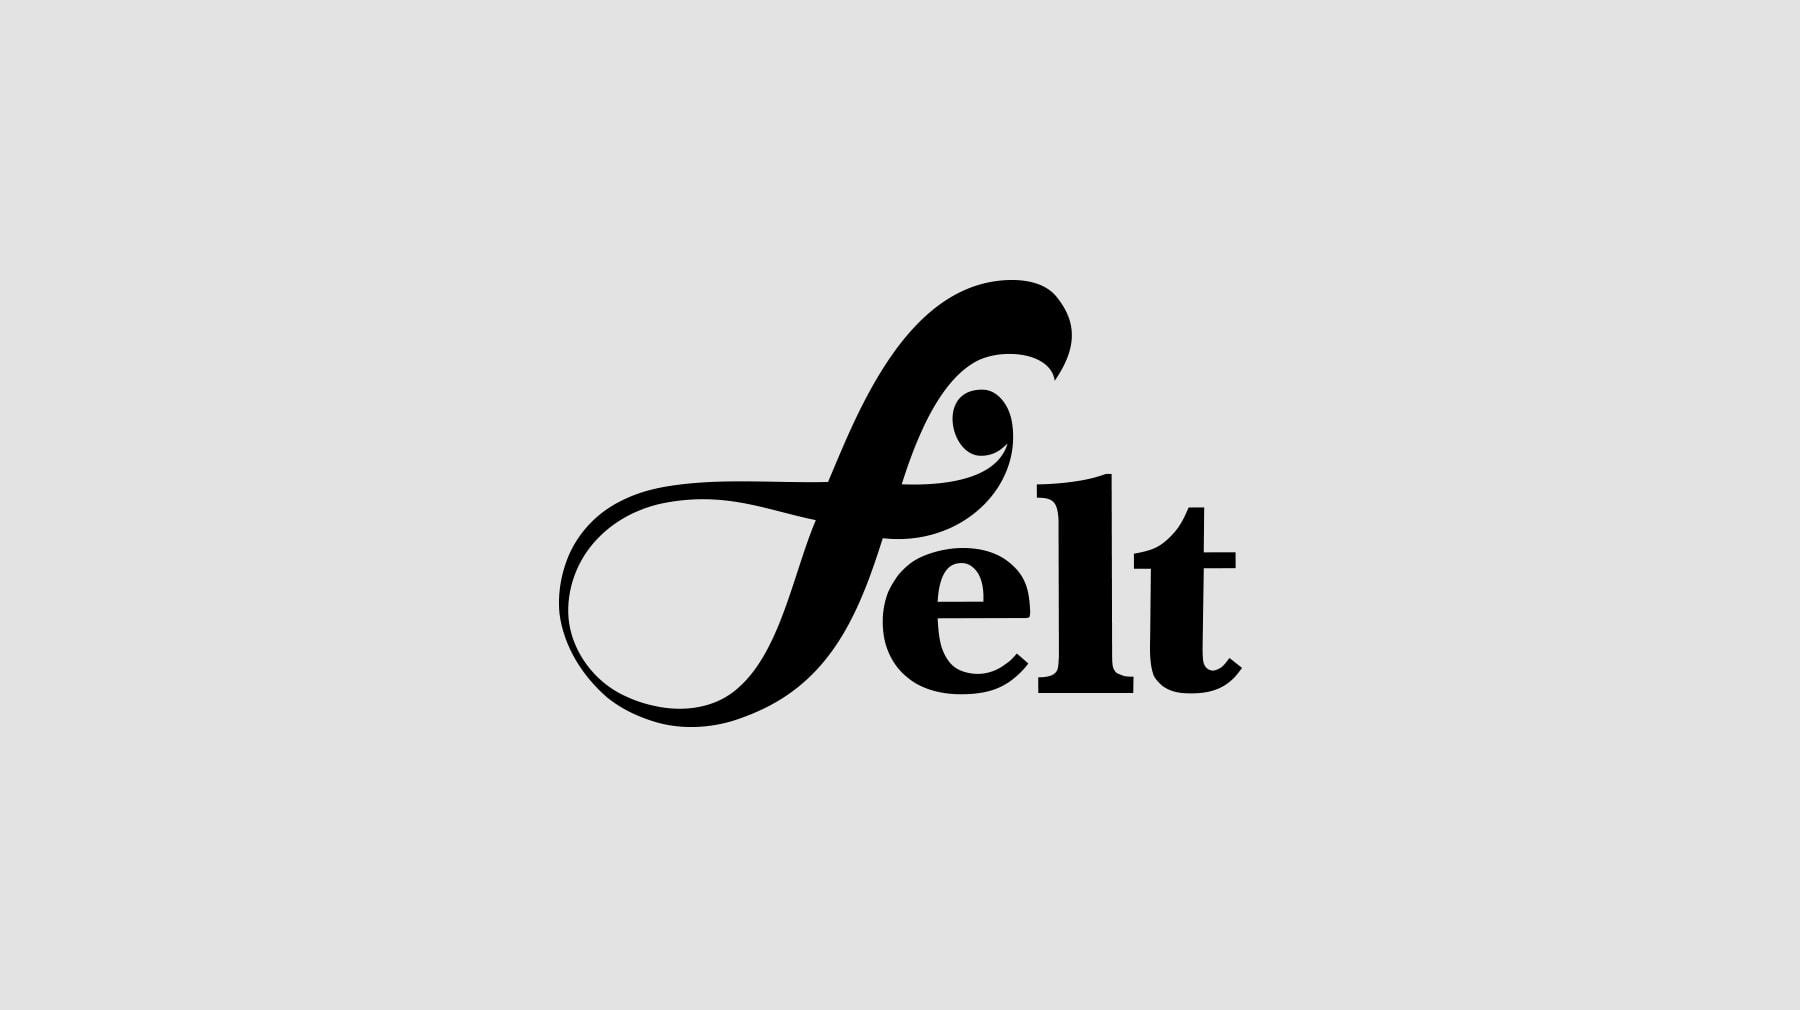 feltlogo1